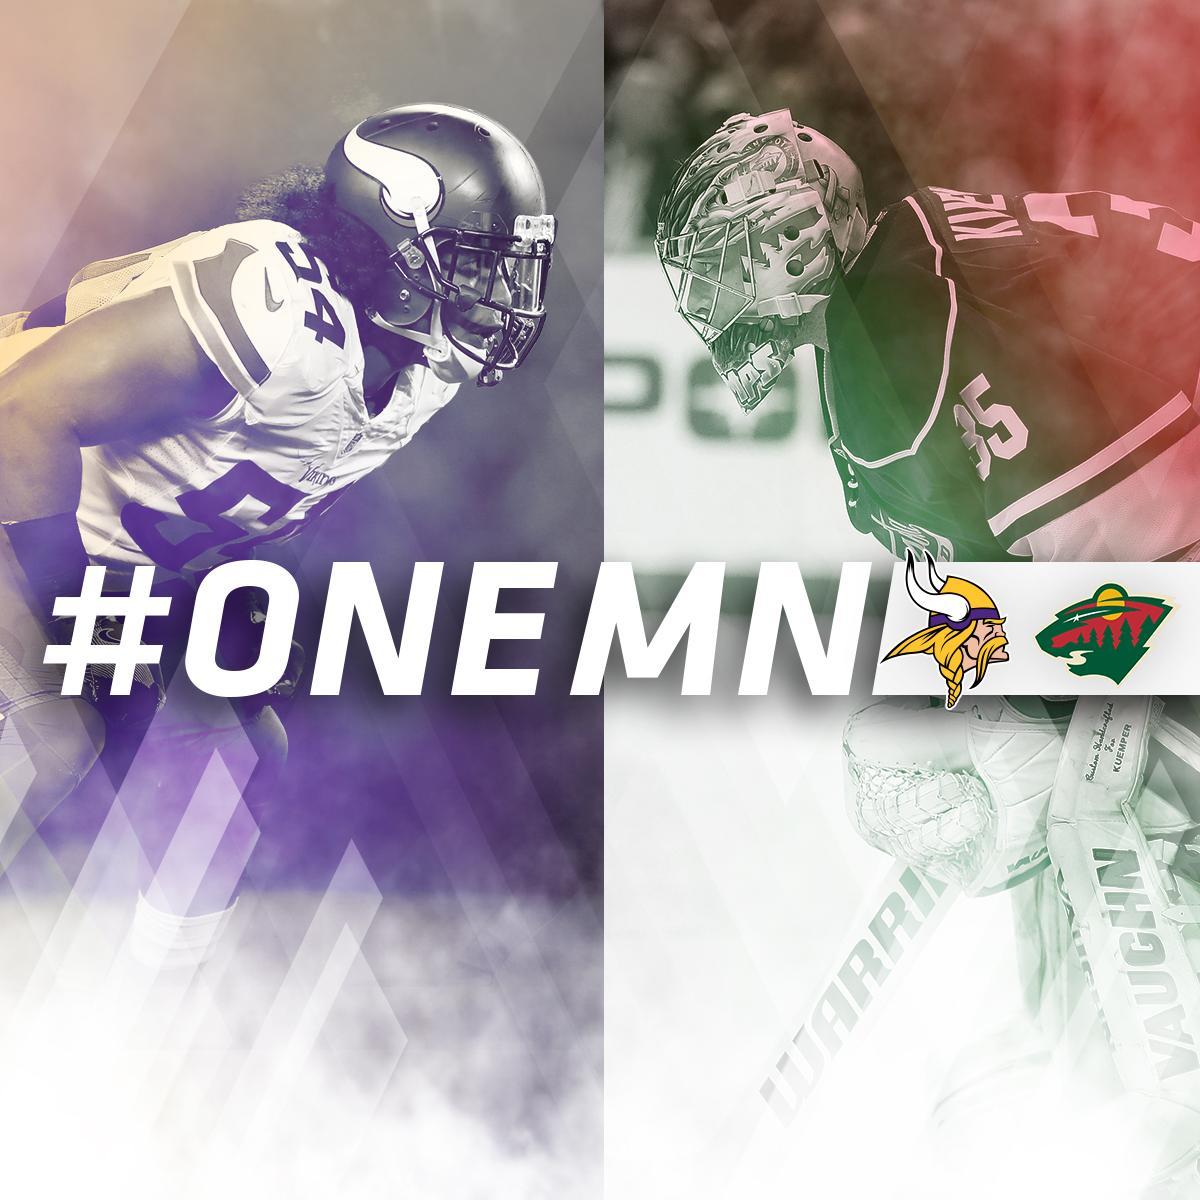 Good luck during the playoffs, @mnwild! #OneMN